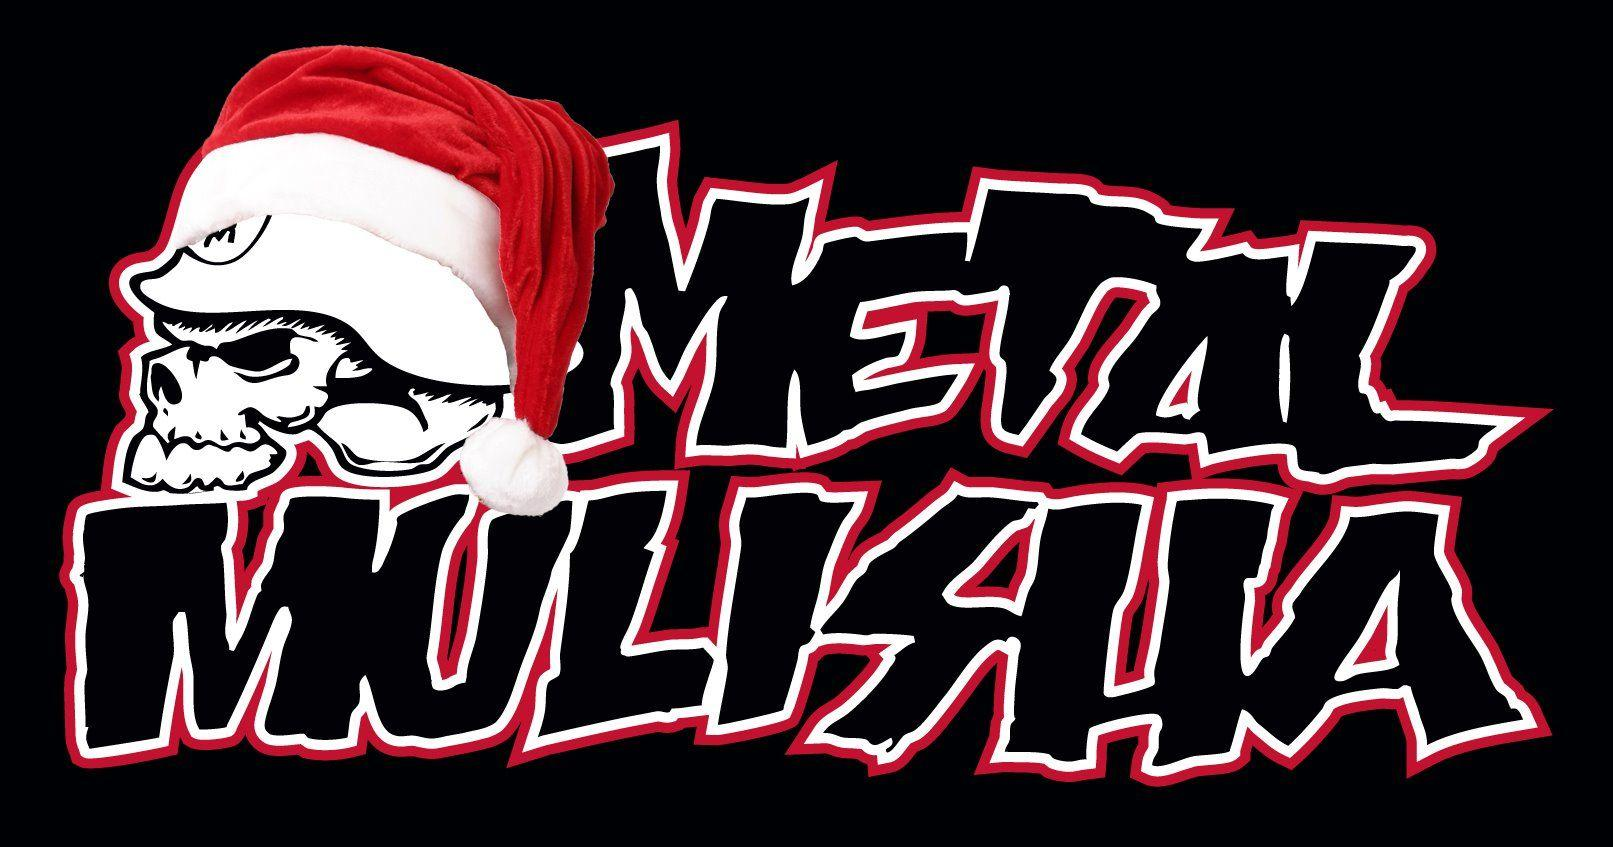 Metal Mulisha Backgrounds Free Download SubWallpaper